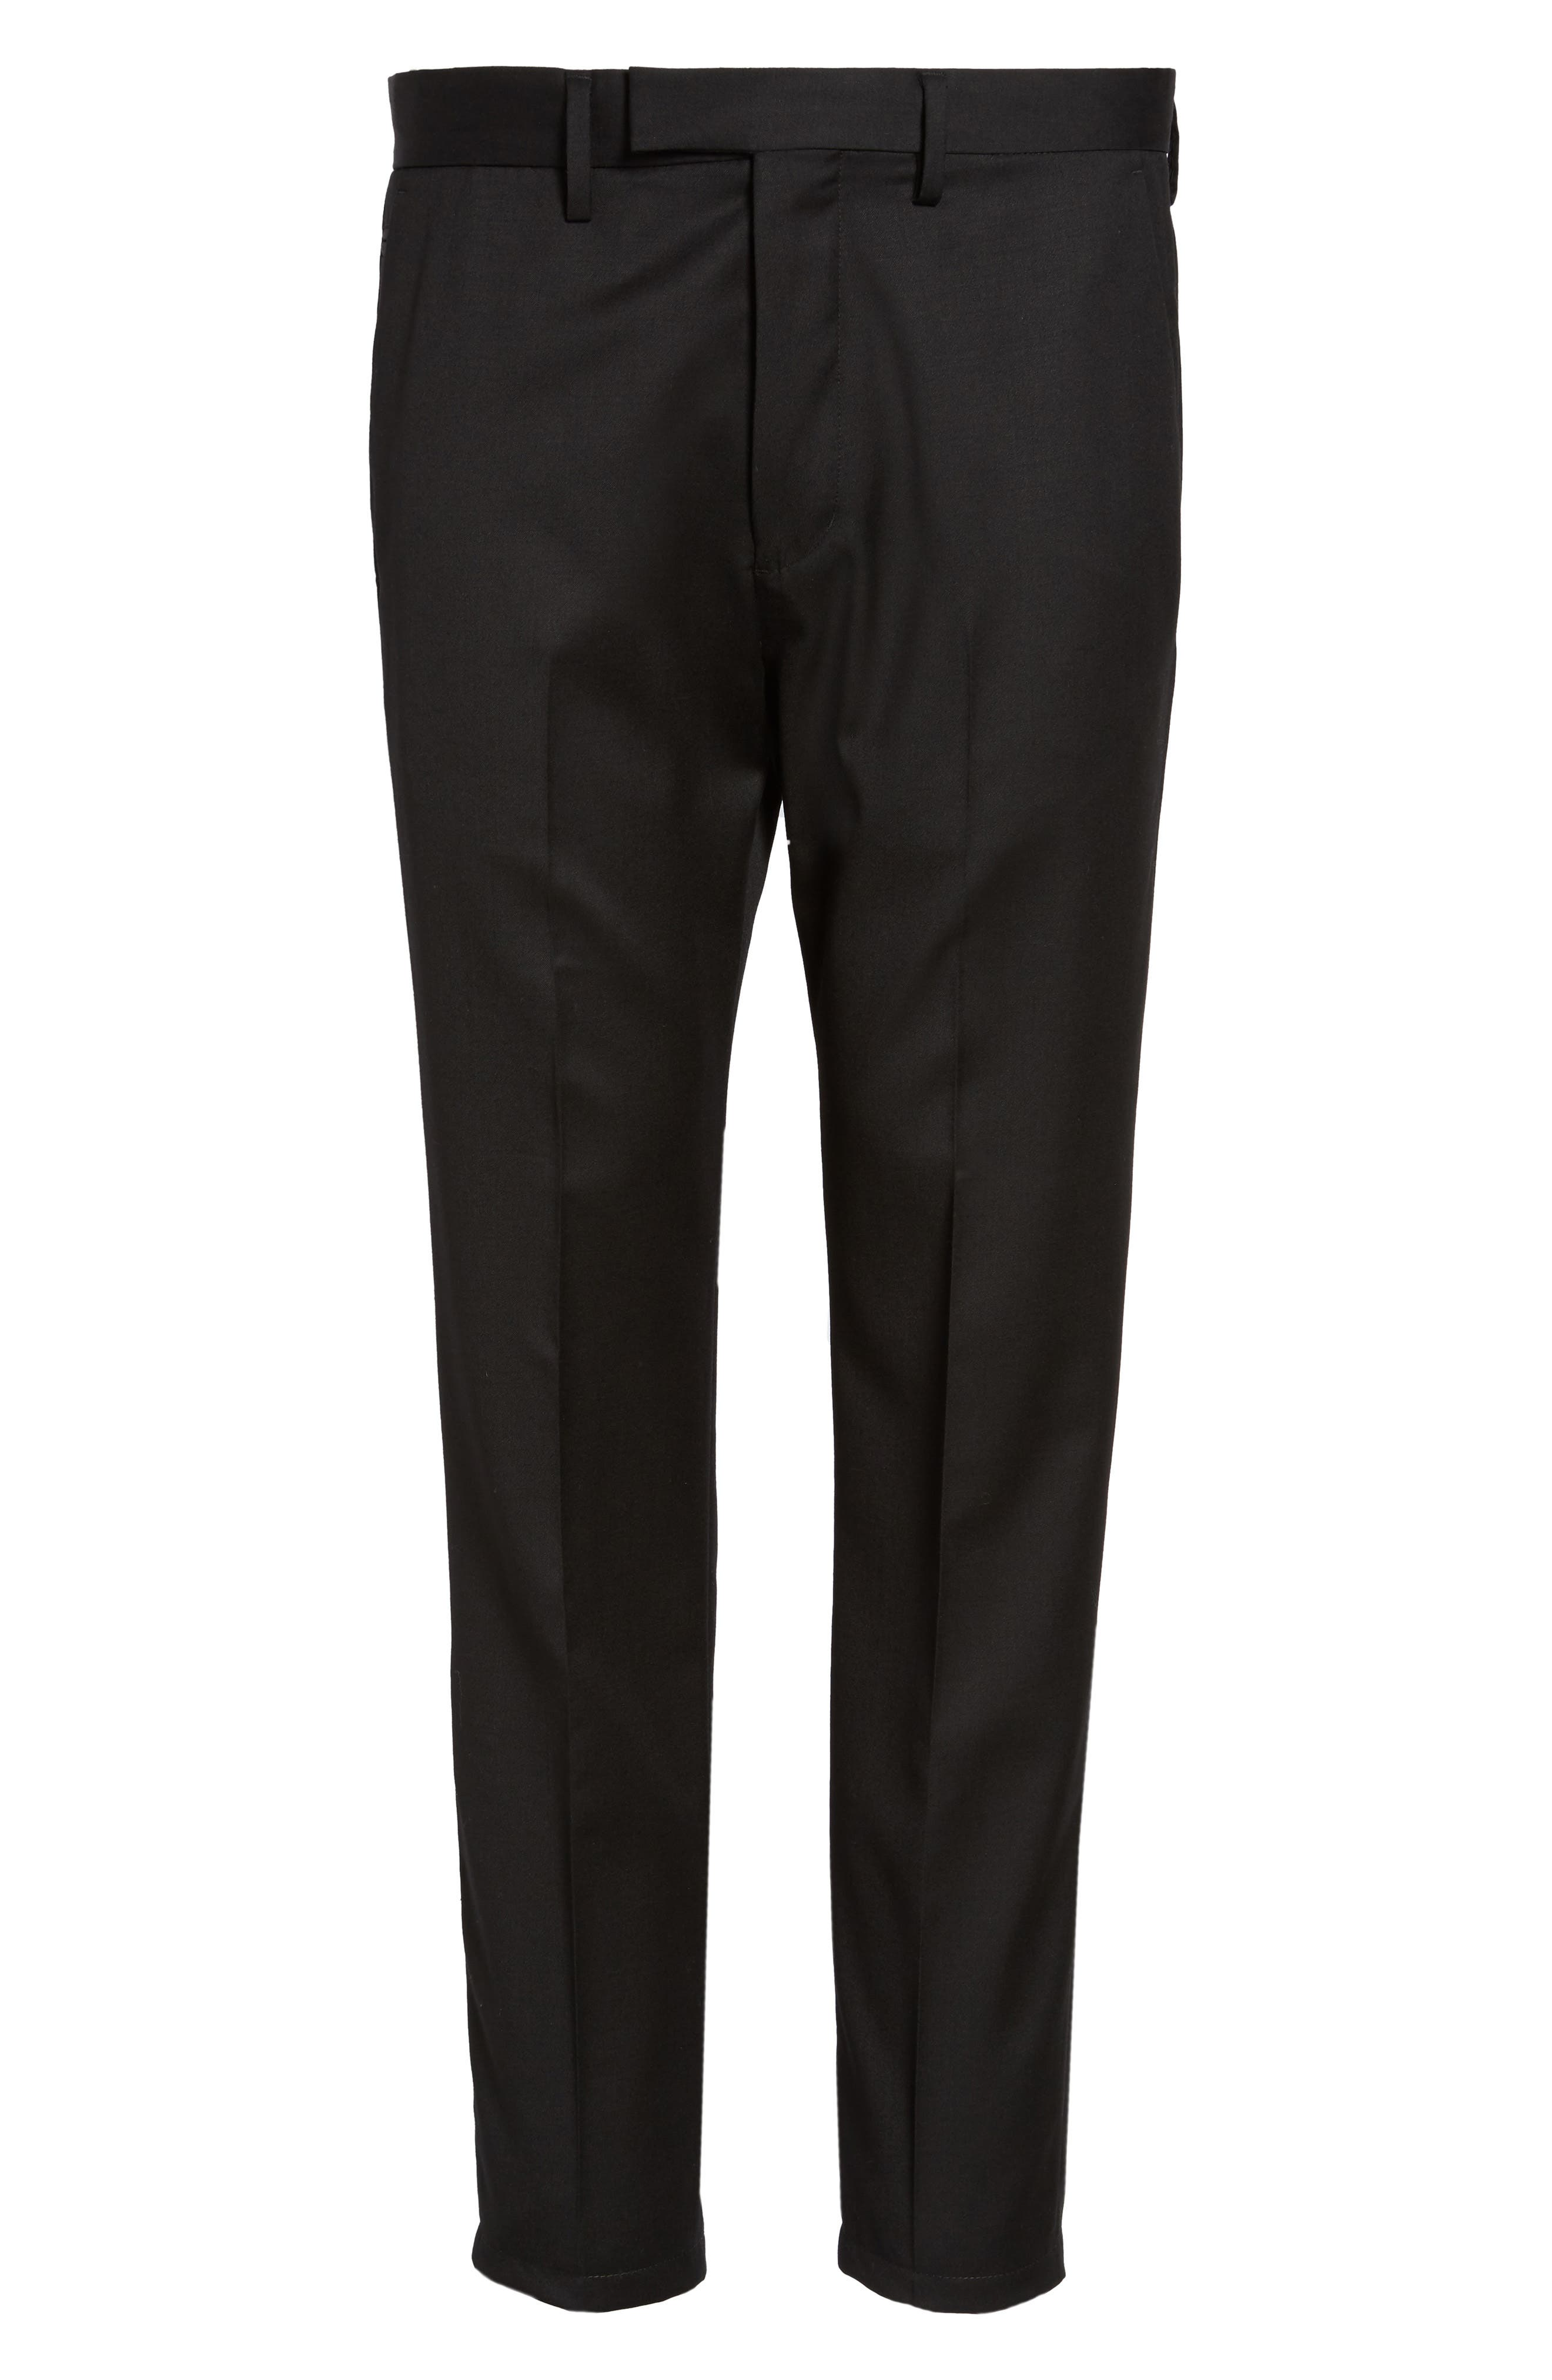 Slim Wool Trousers,                             Alternate thumbnail 6, color,                             Black Caviar